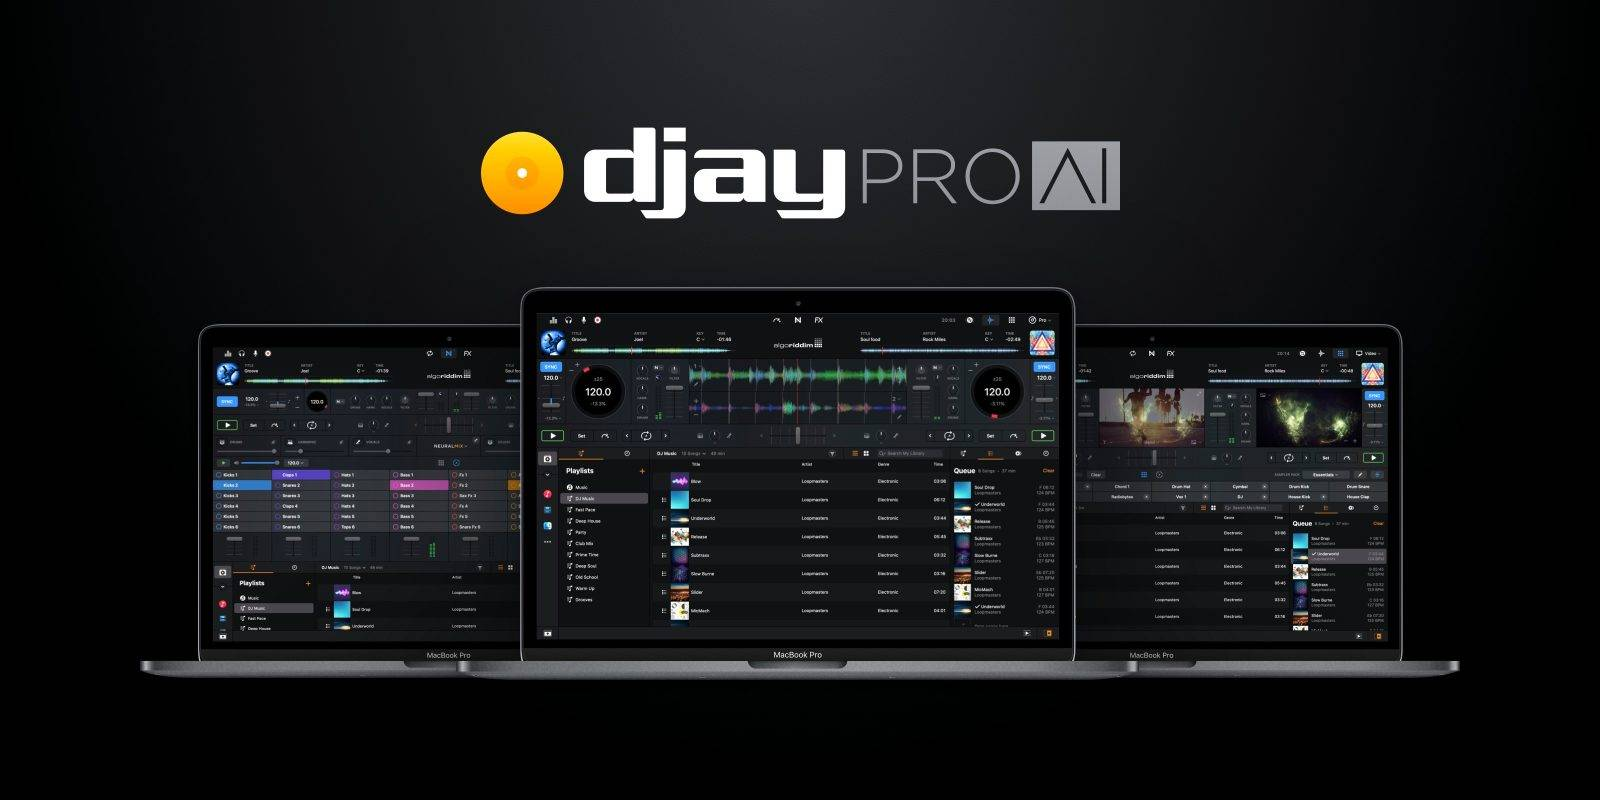 djay-pro-ai-mac-apple-silicon